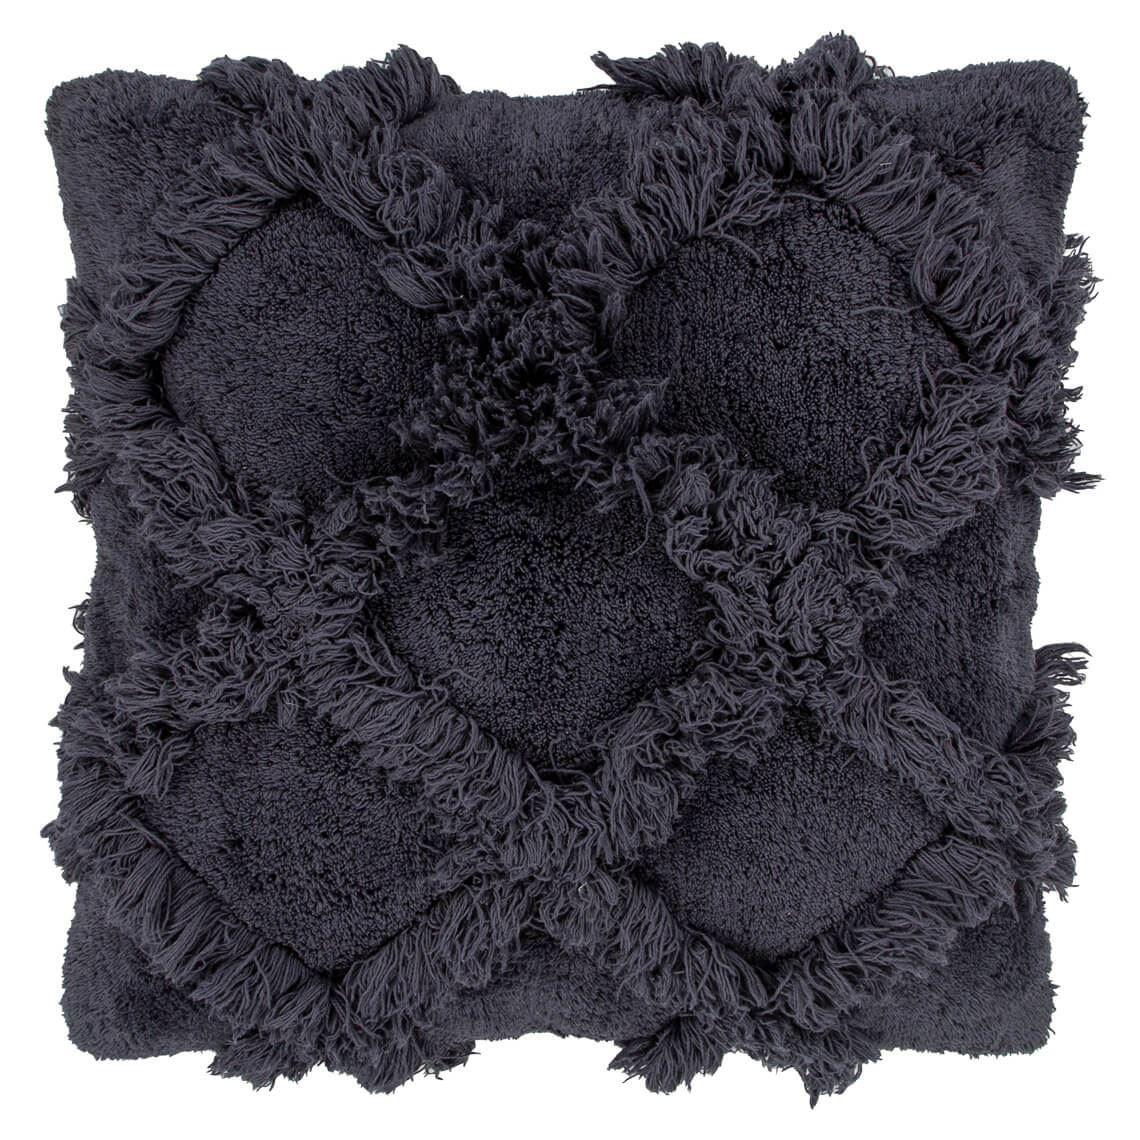 Daou Cushion Size W 50cm x D 50cm x H 12cm in Blue Freedom